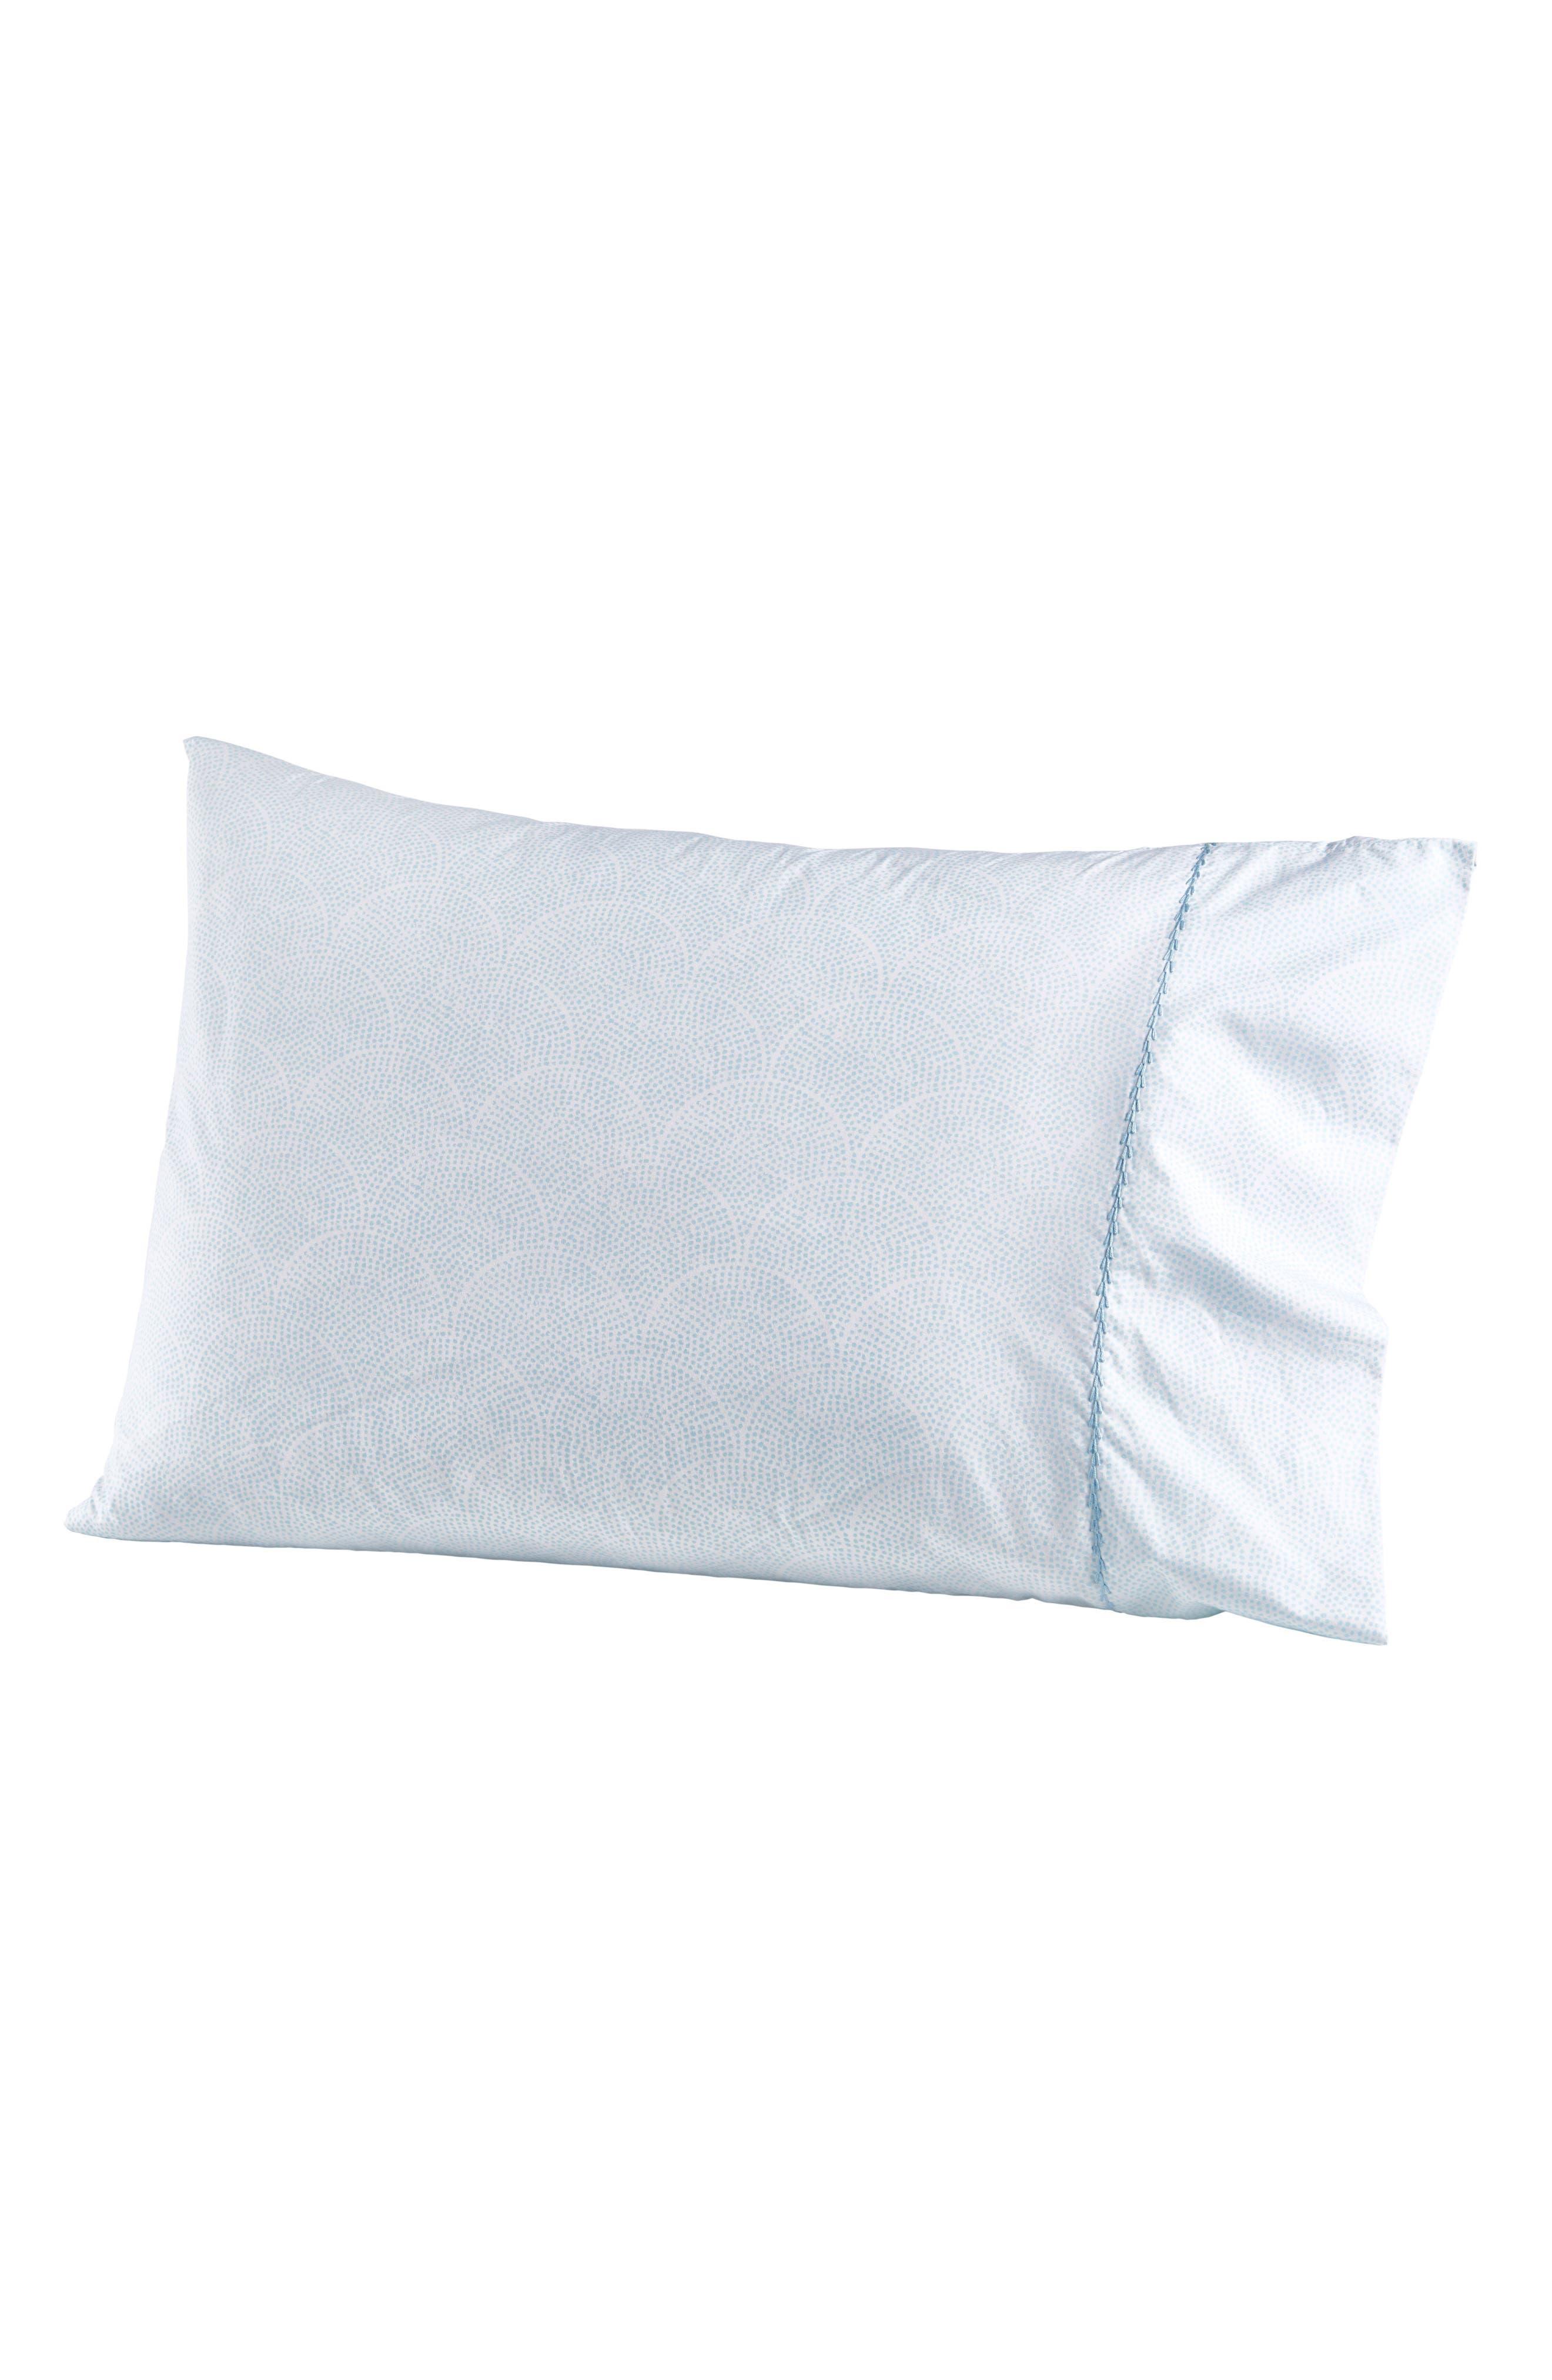 Vatula 400 Thread Count Pillowcases,                         Main,                         color, Seaglass